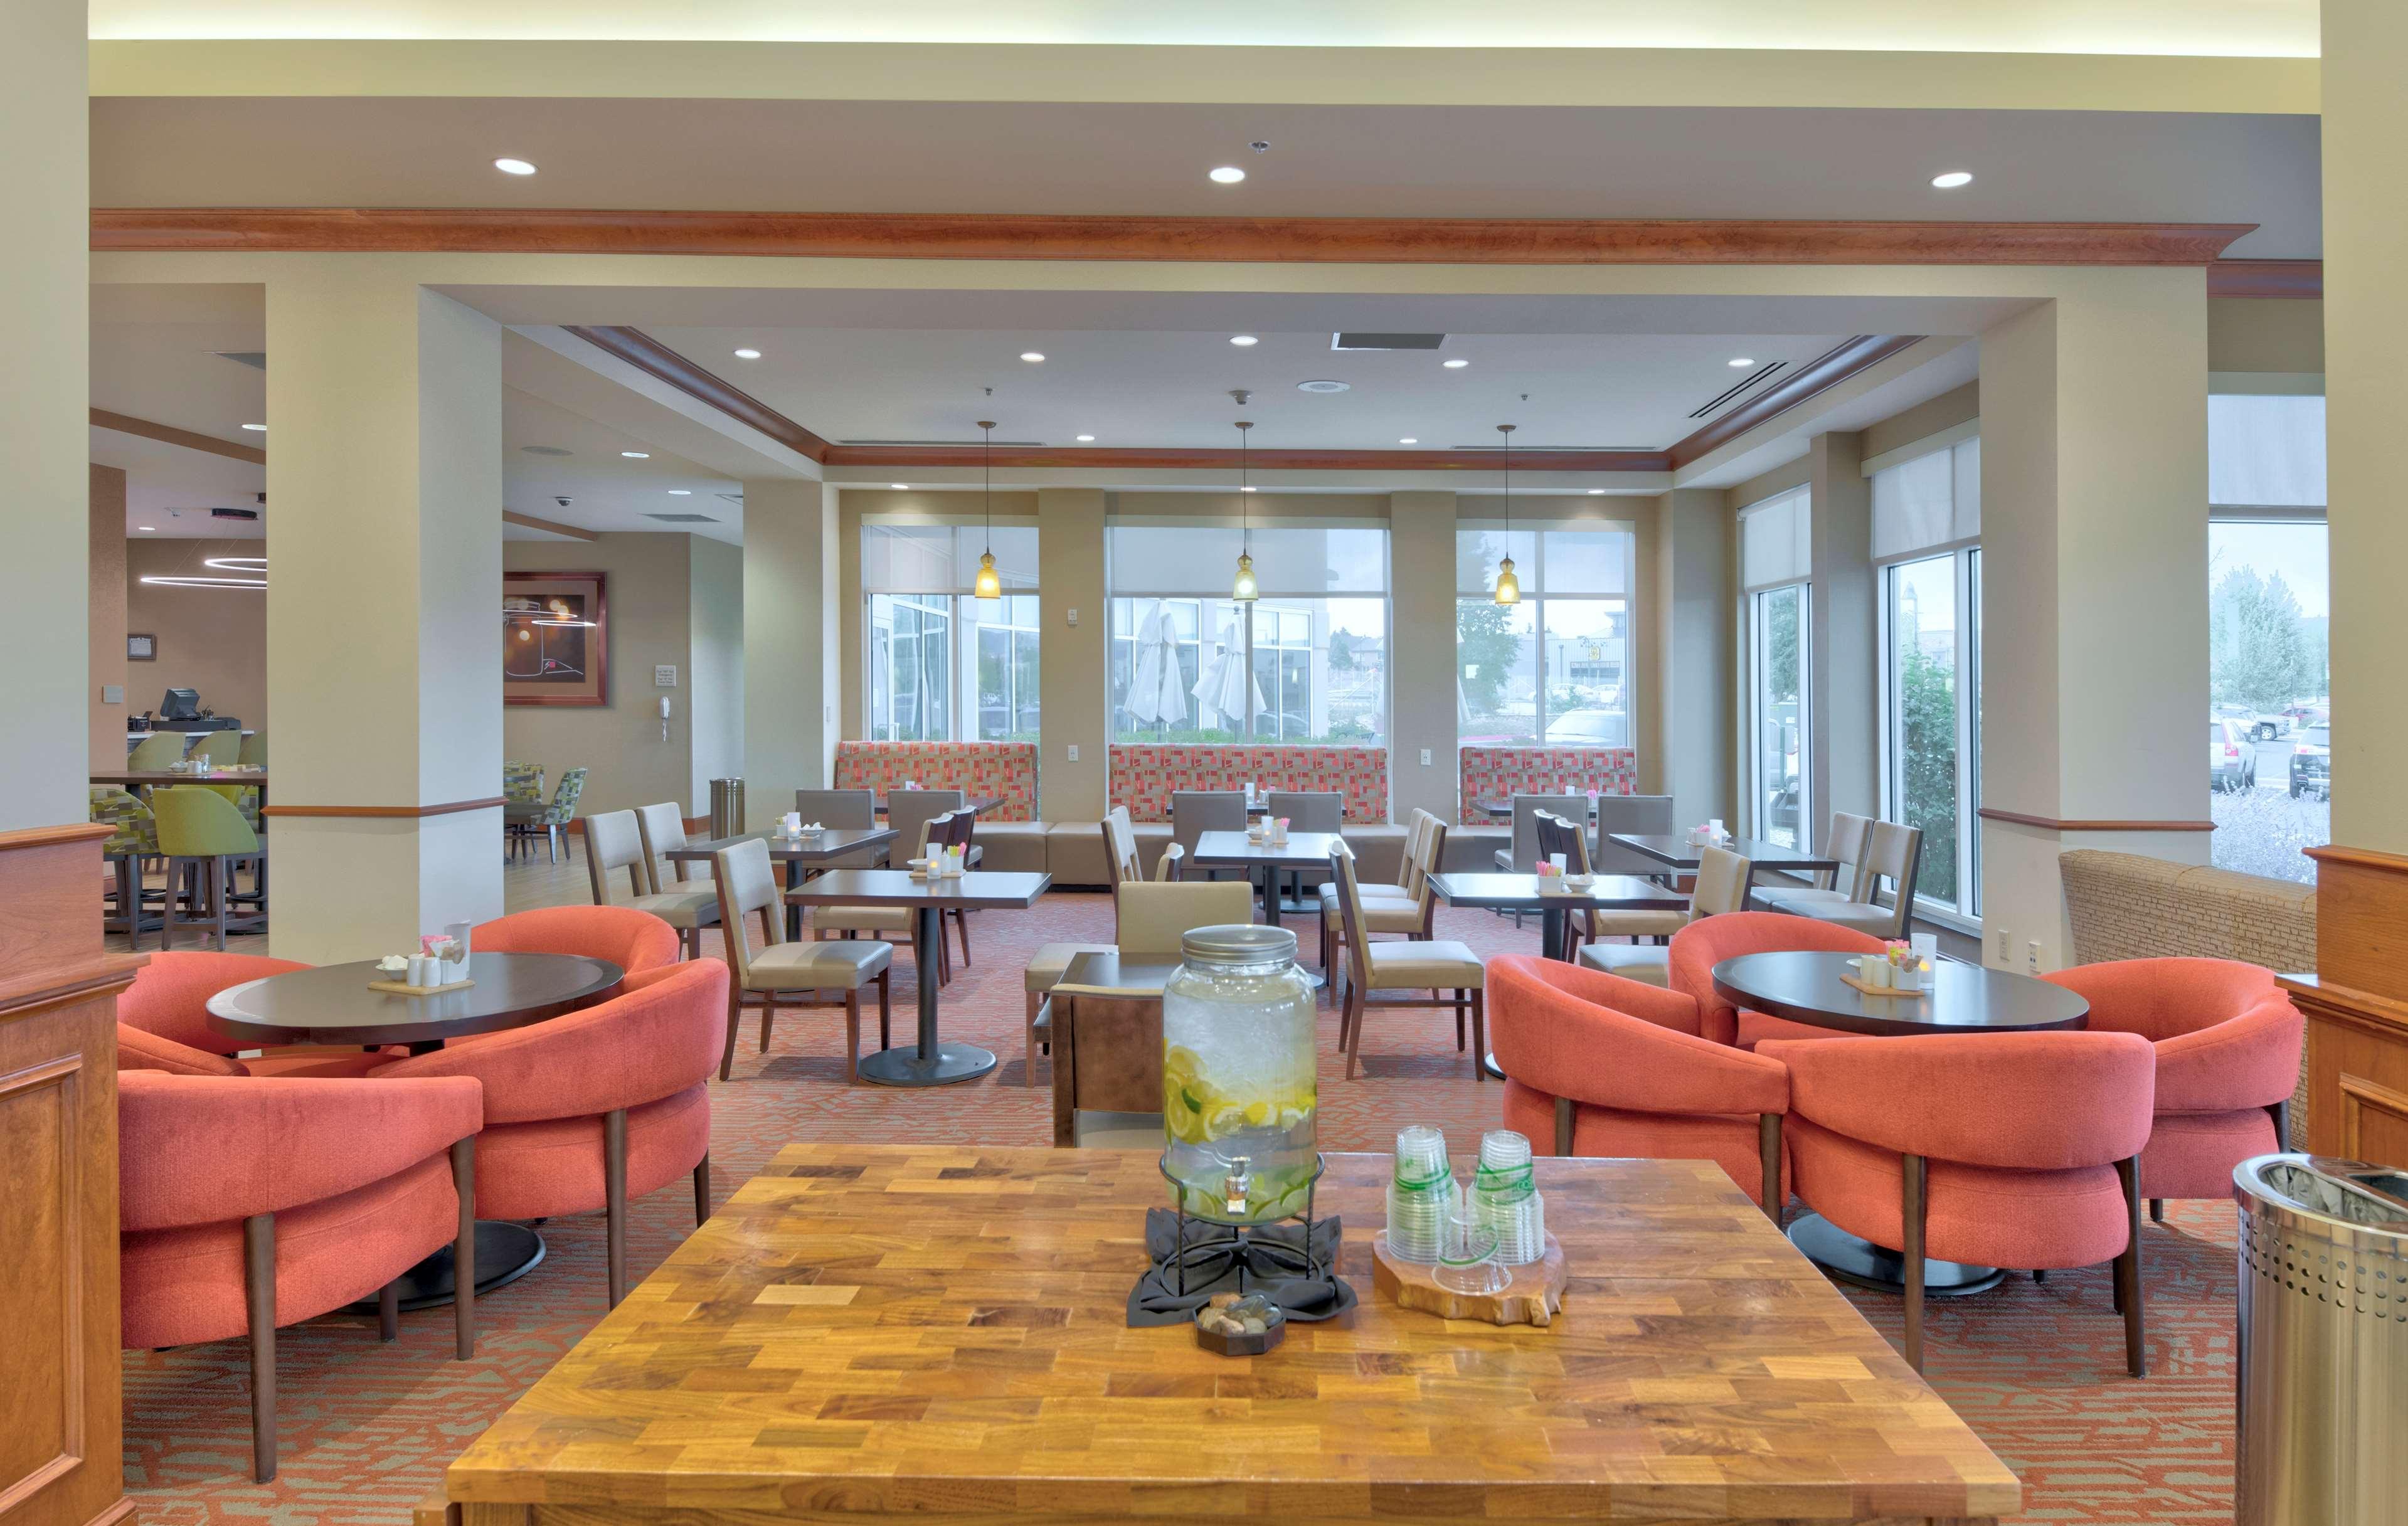 Hilton Garden Inn Laramie image 5